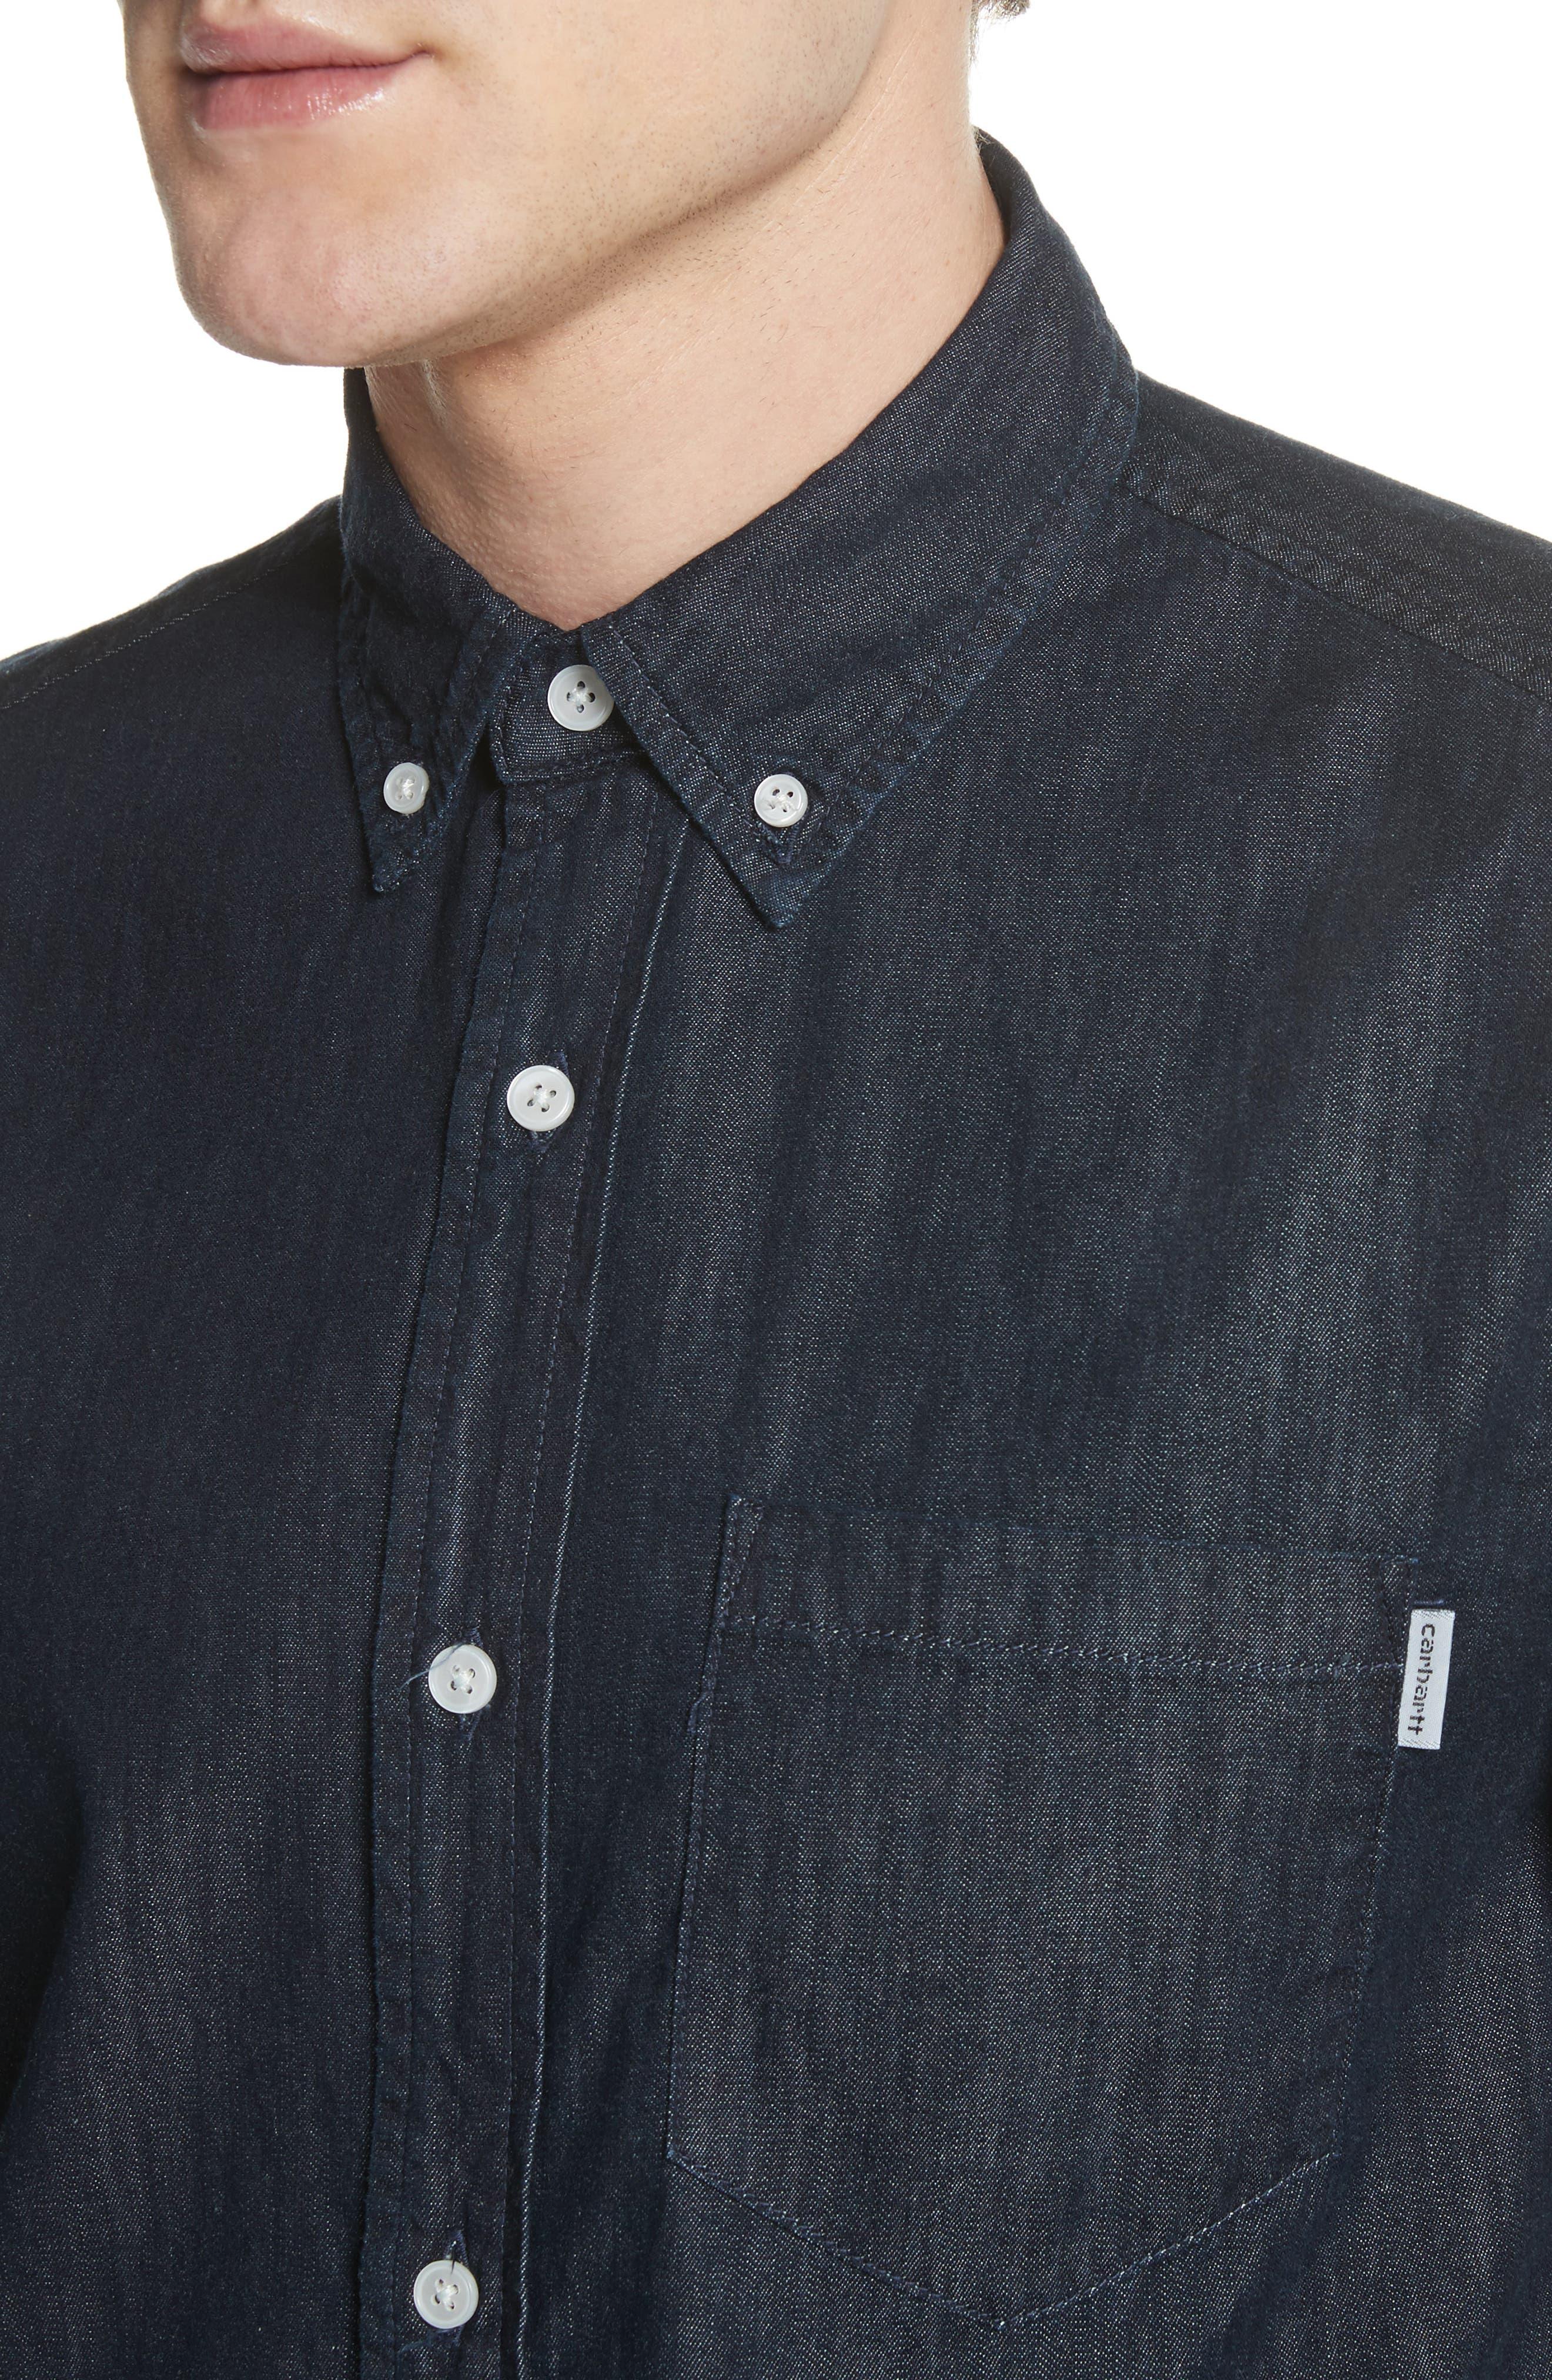 Civil Denim Shirt,                             Alternate thumbnail 4, color,                             400